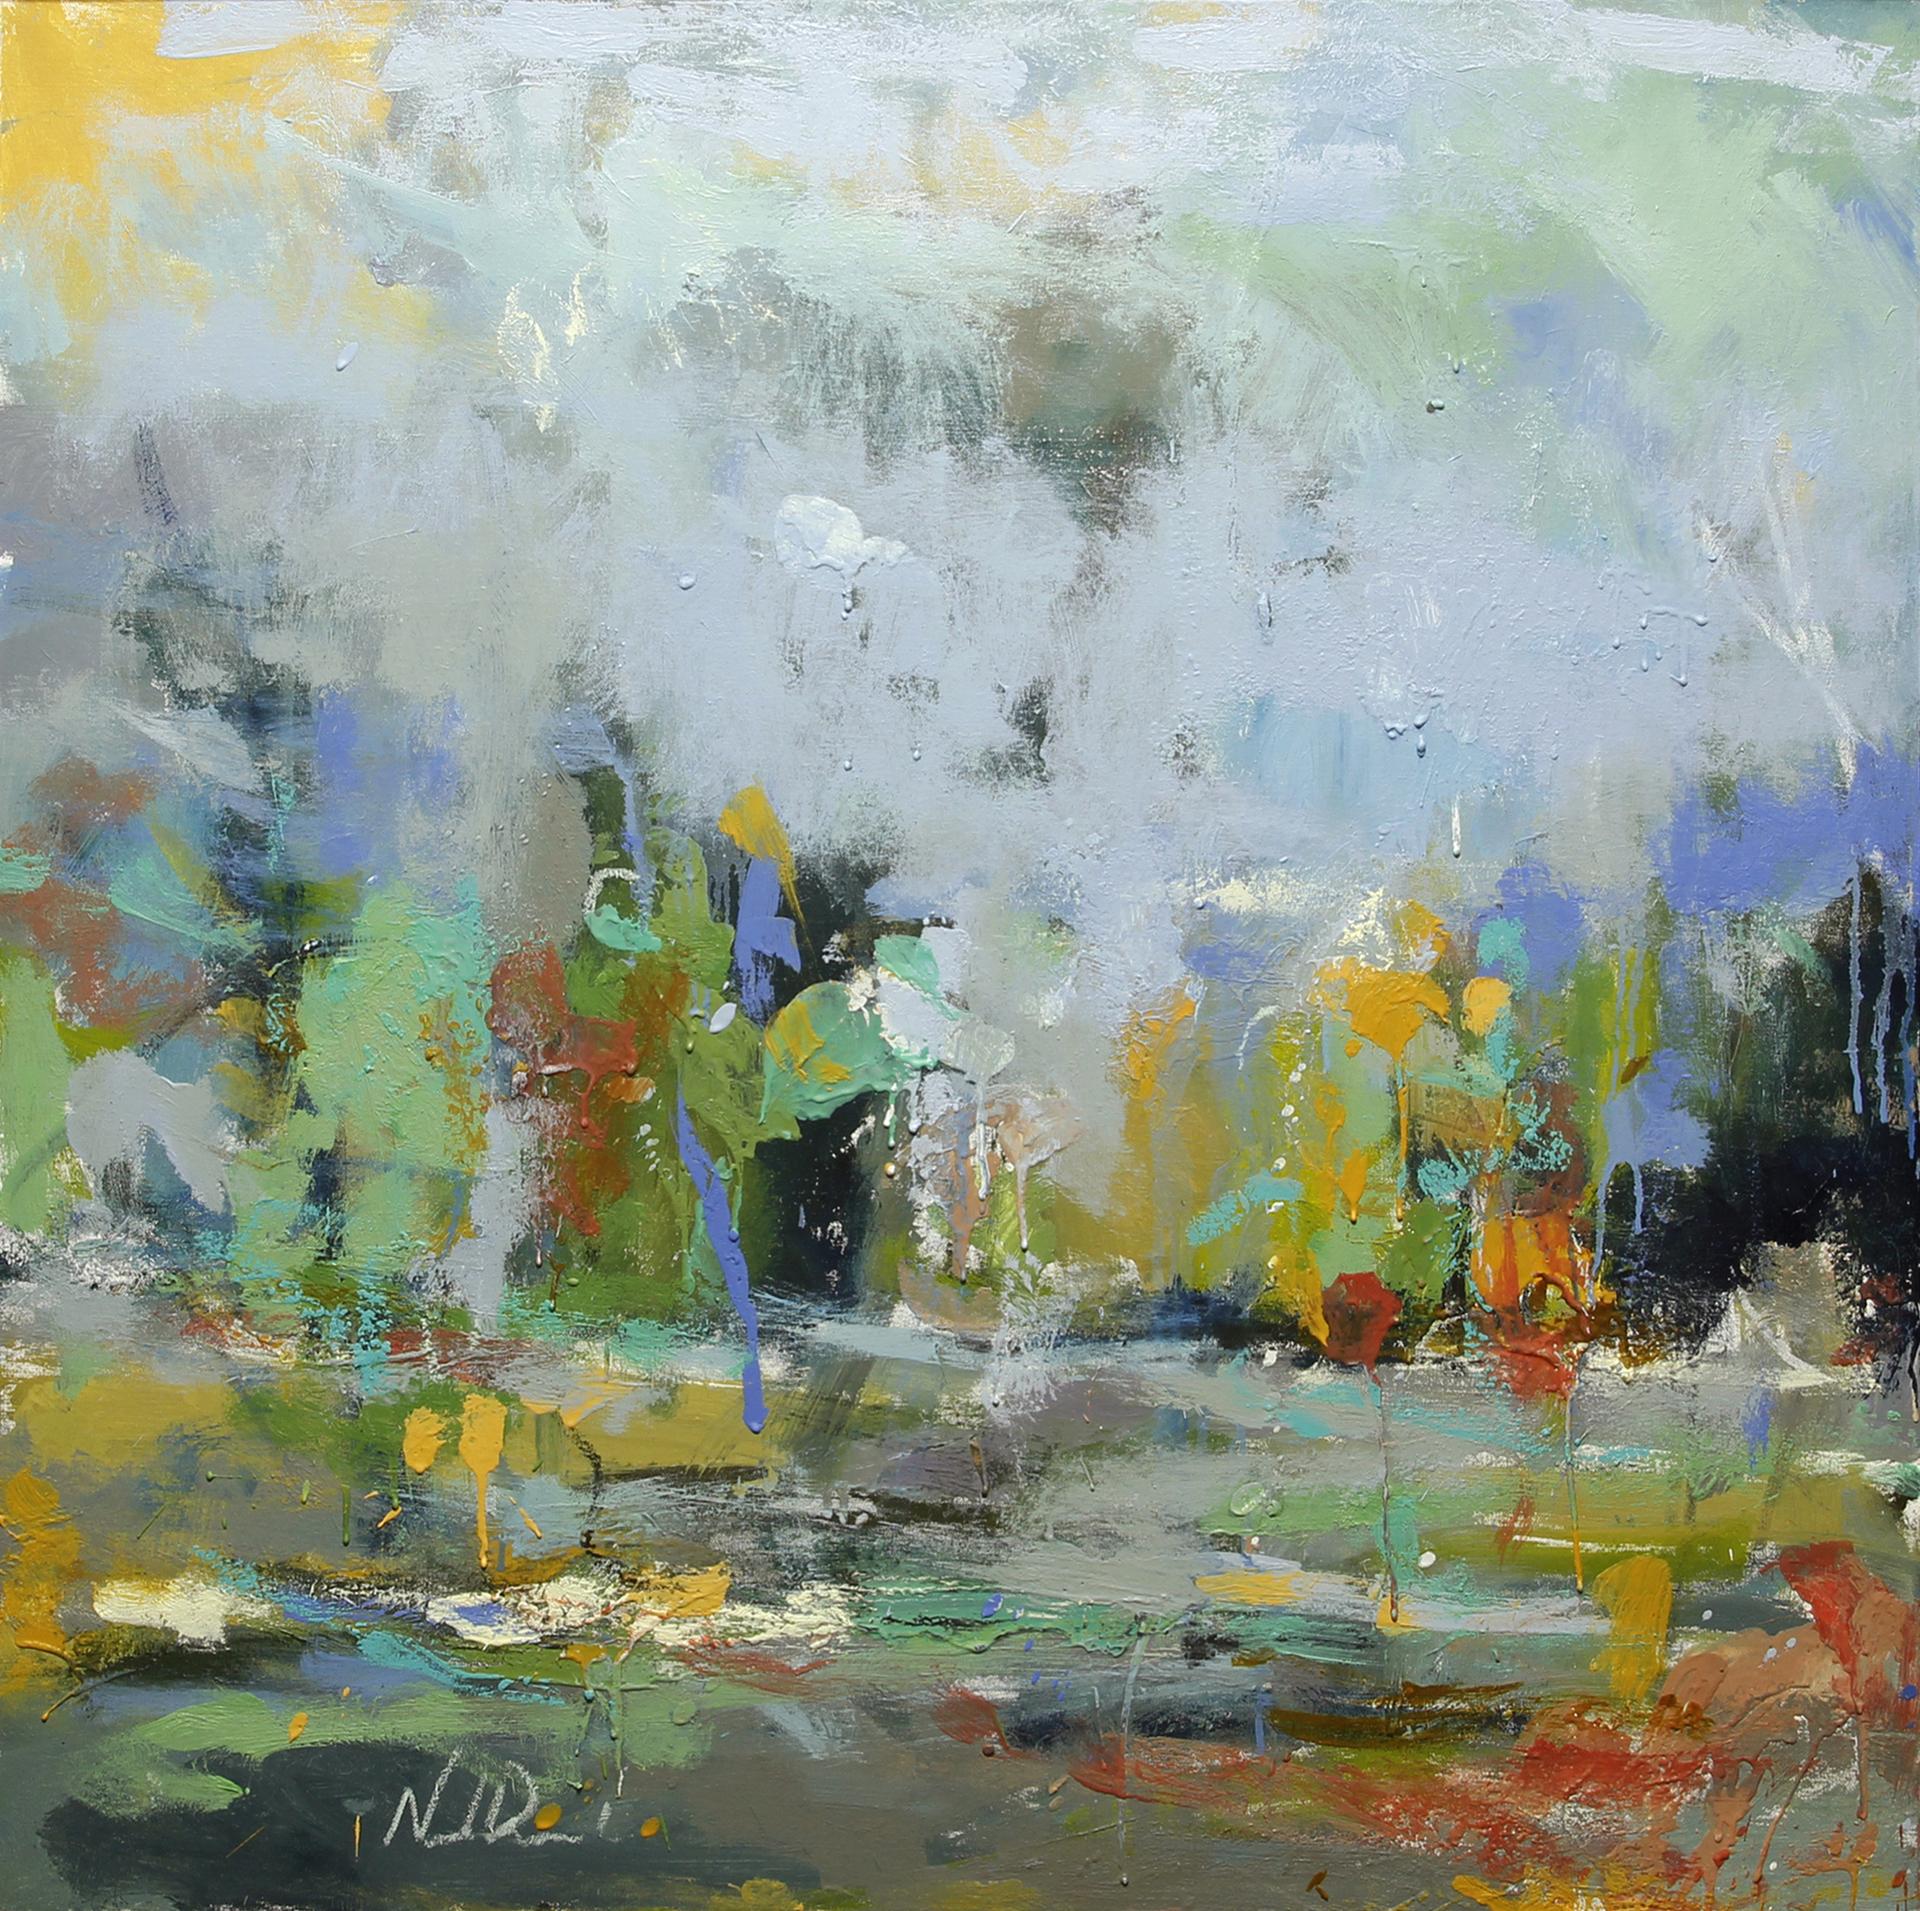 Evening Delight by Noah Desmond